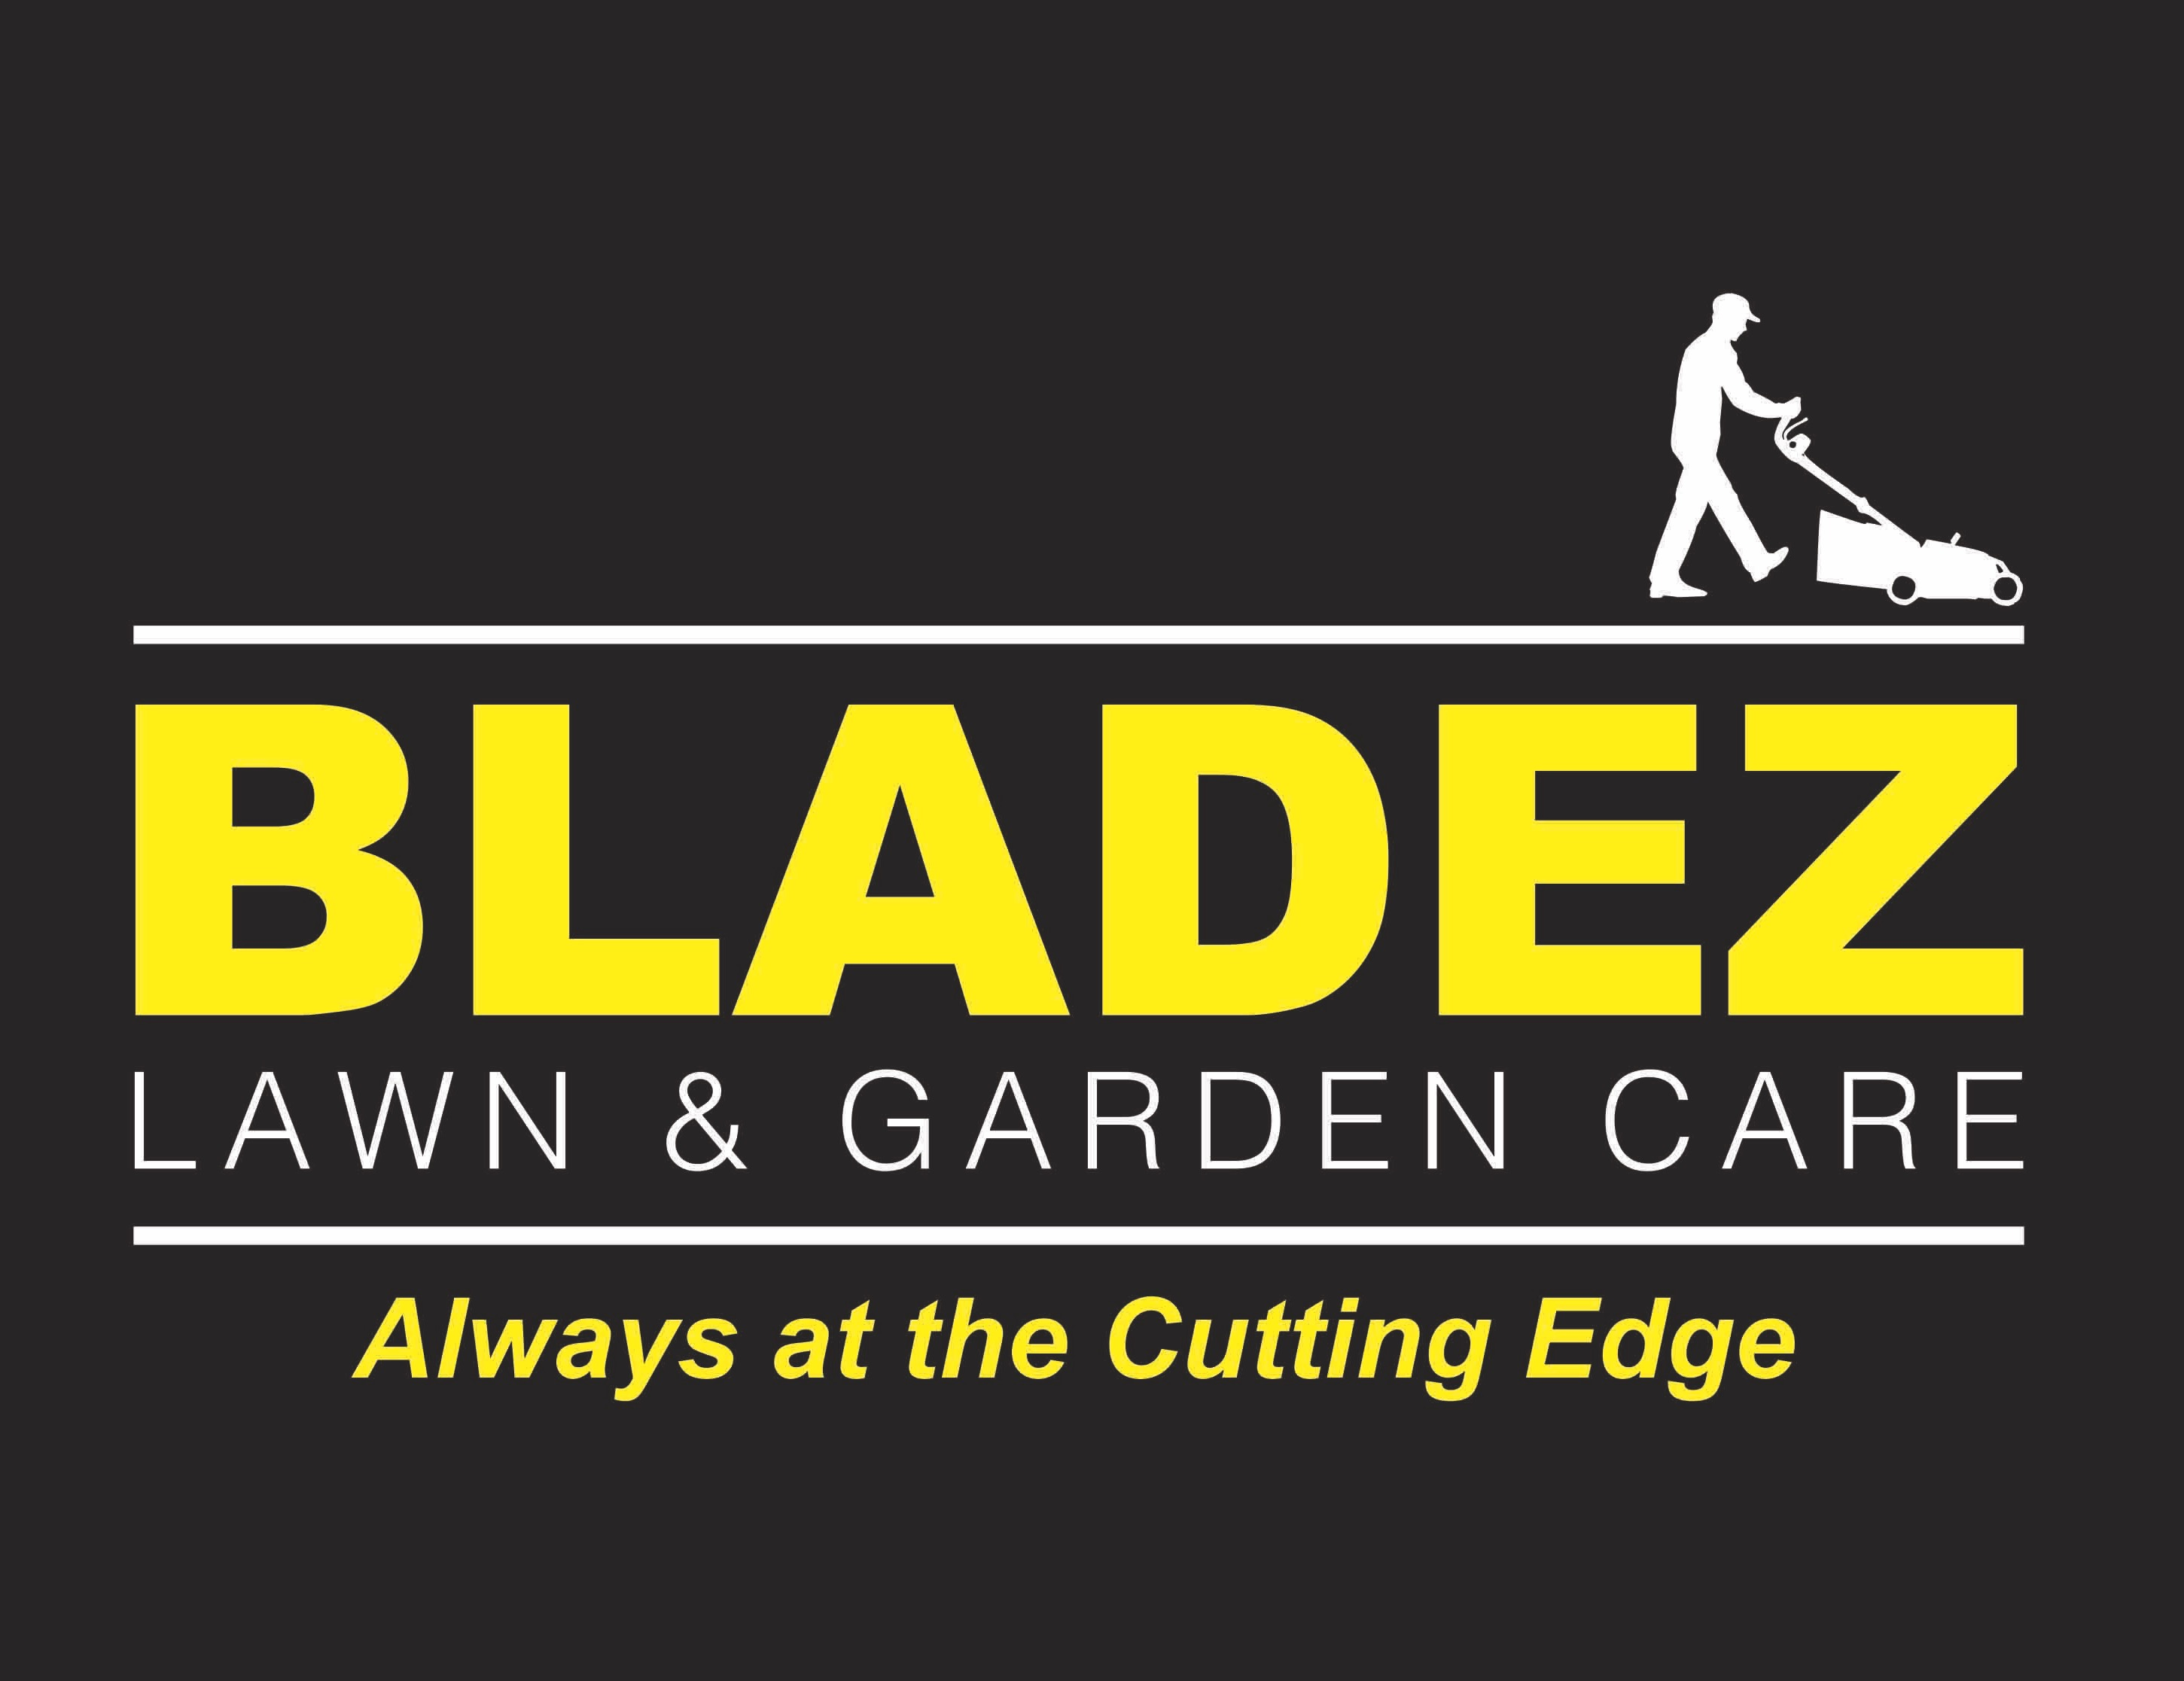 BLADEZ Lawn & Garden Care